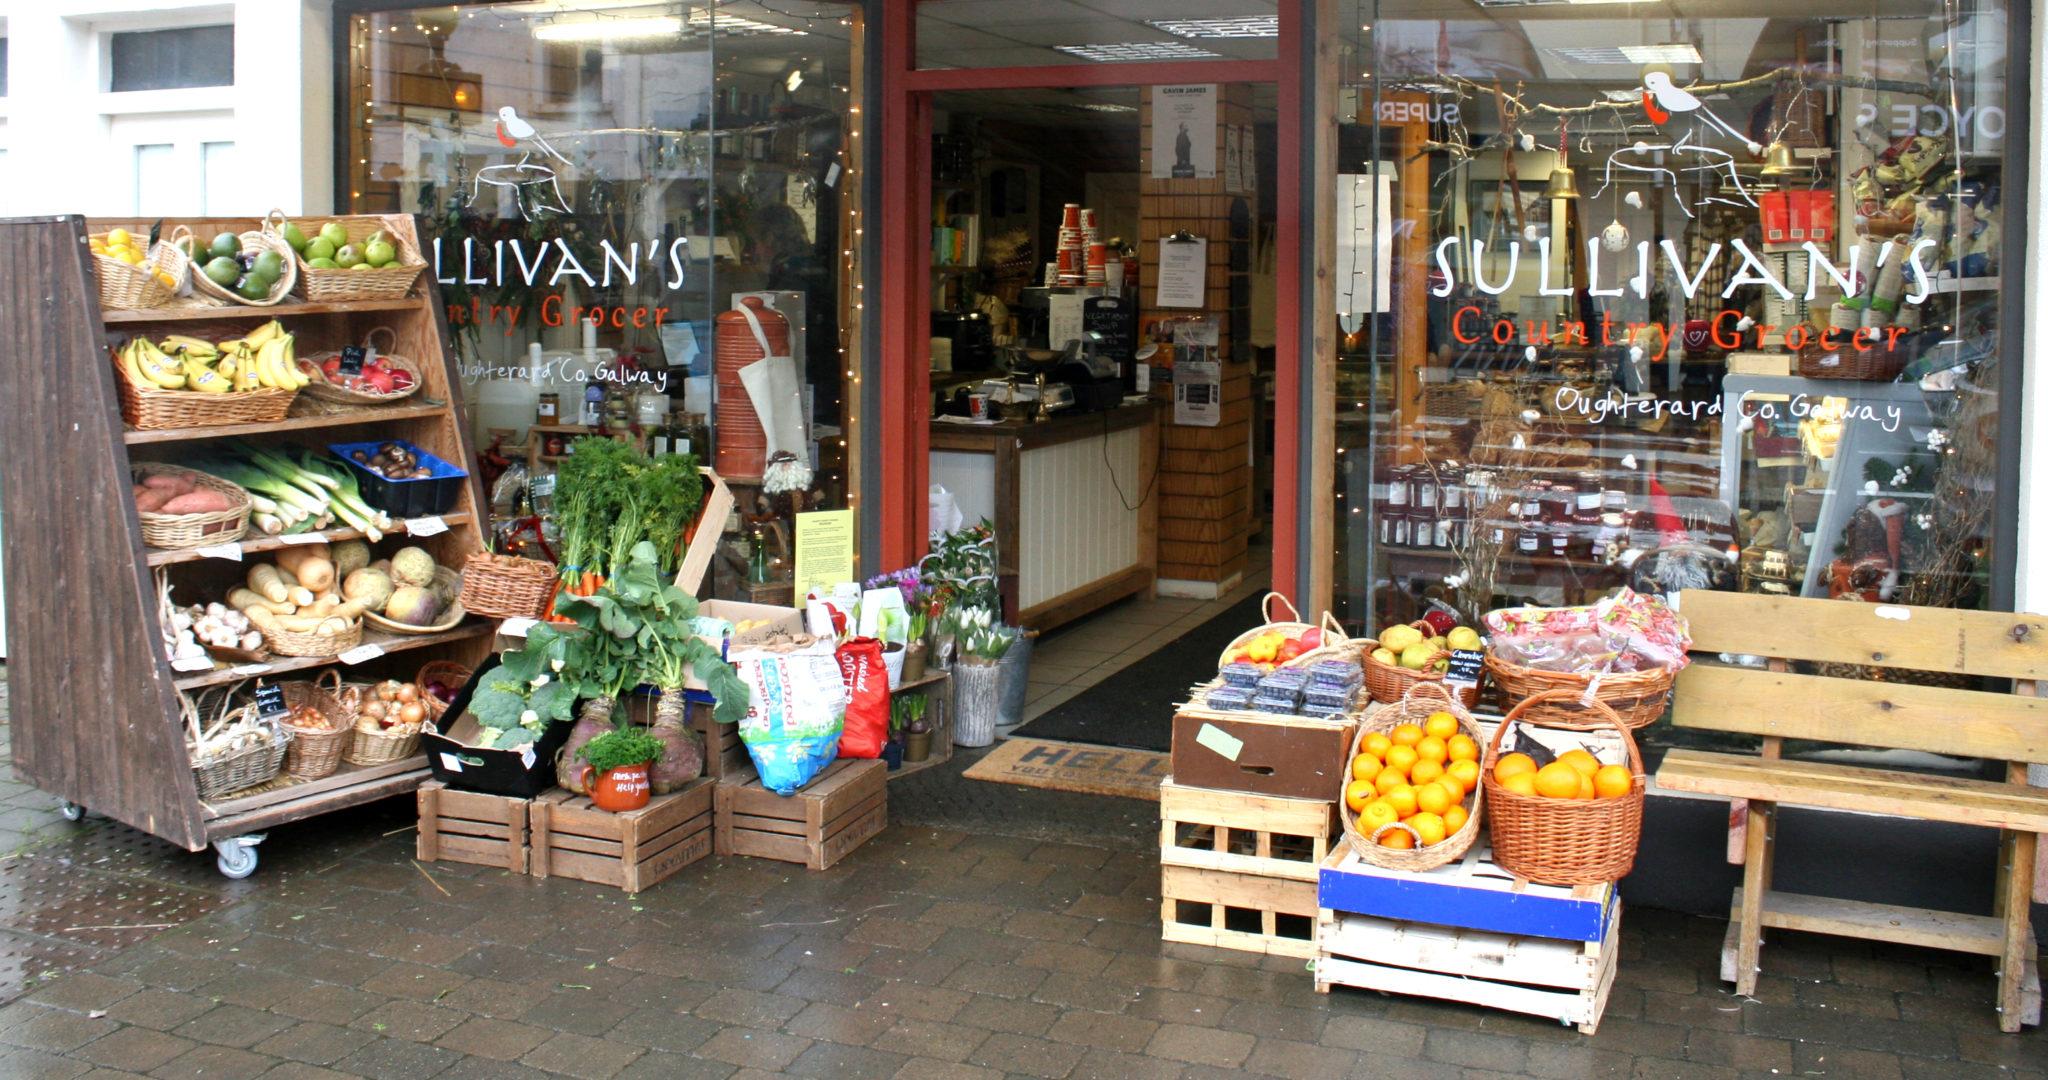 Sullivans Country Grocer Fresh Fruit and Vegetables